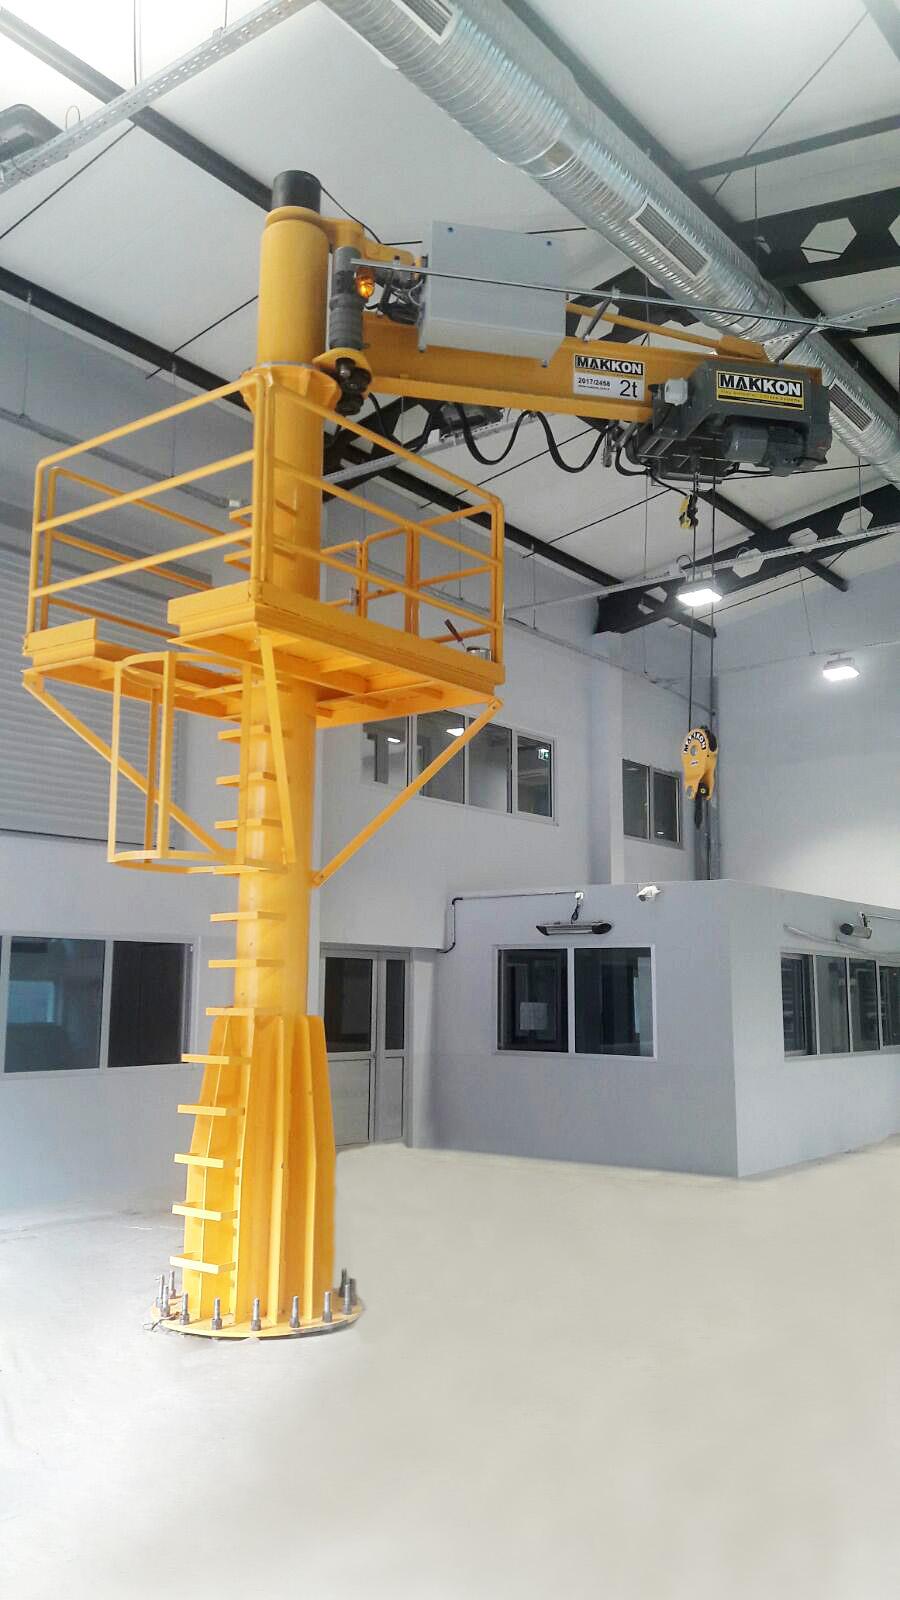 dayton jib crane installation manual